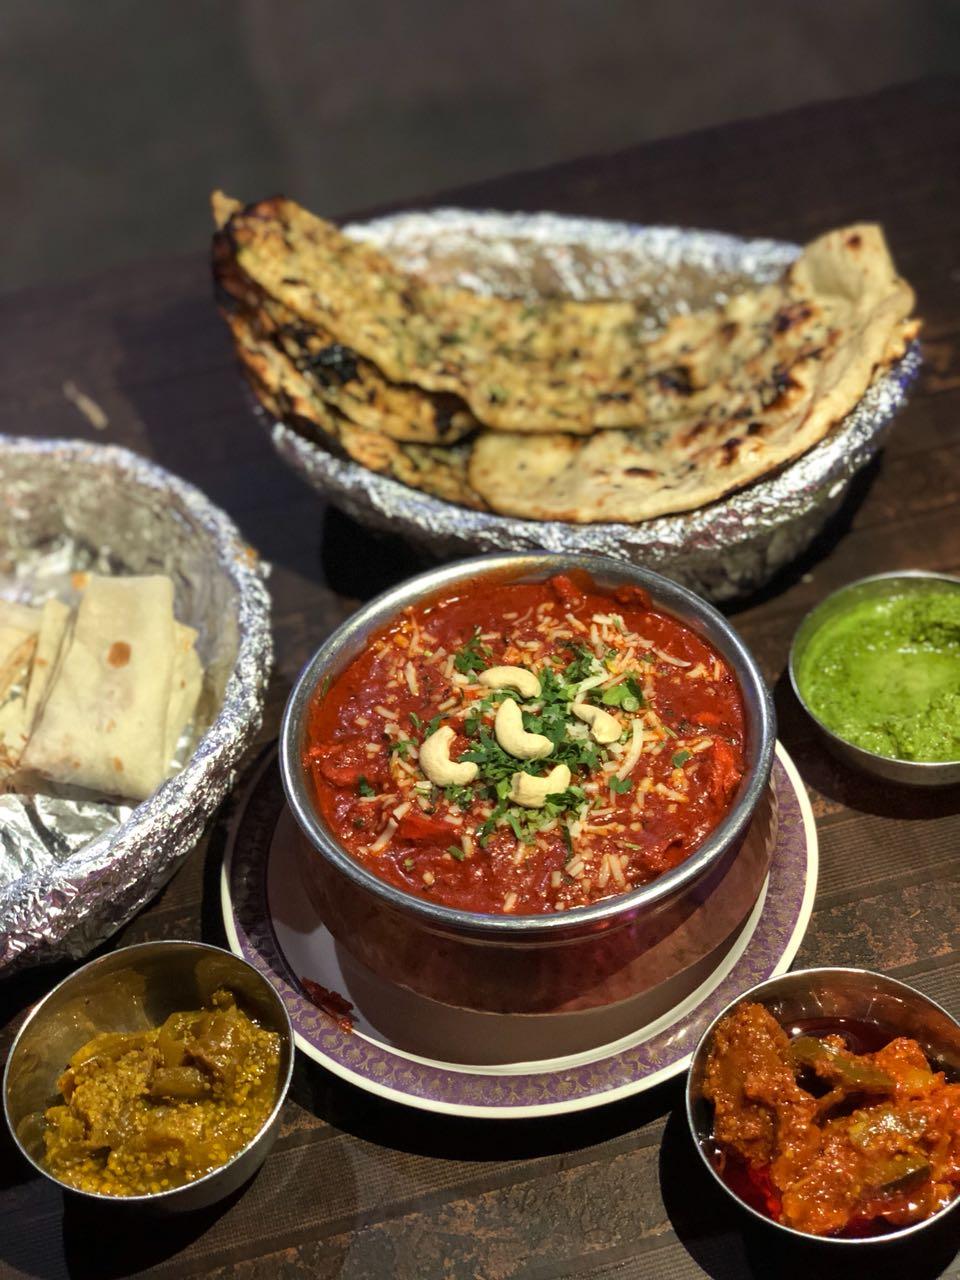 naan, chicken, rommali roti, chutney, achaara, dinner, buffet, bruch